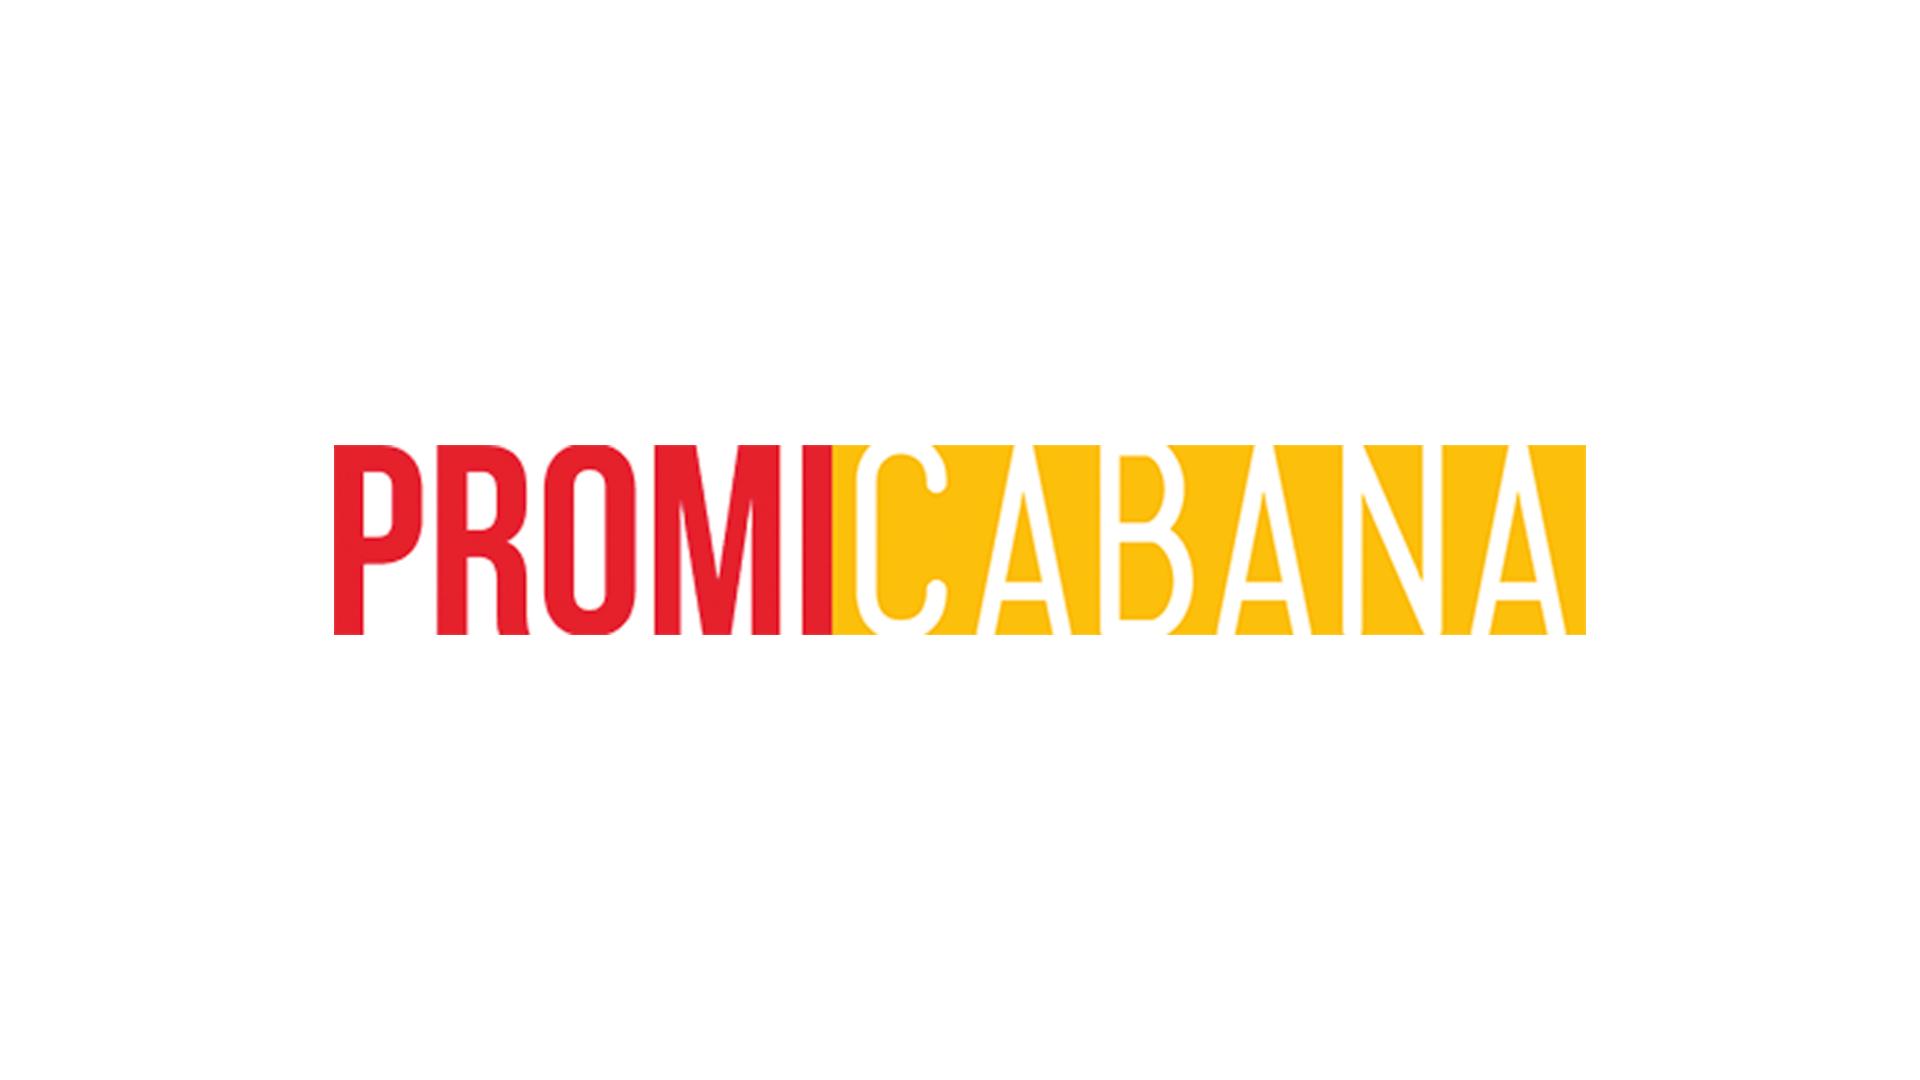 Paul-Blart-Mall-Cop-2-Kevin-James-Kaufhaus-Cop